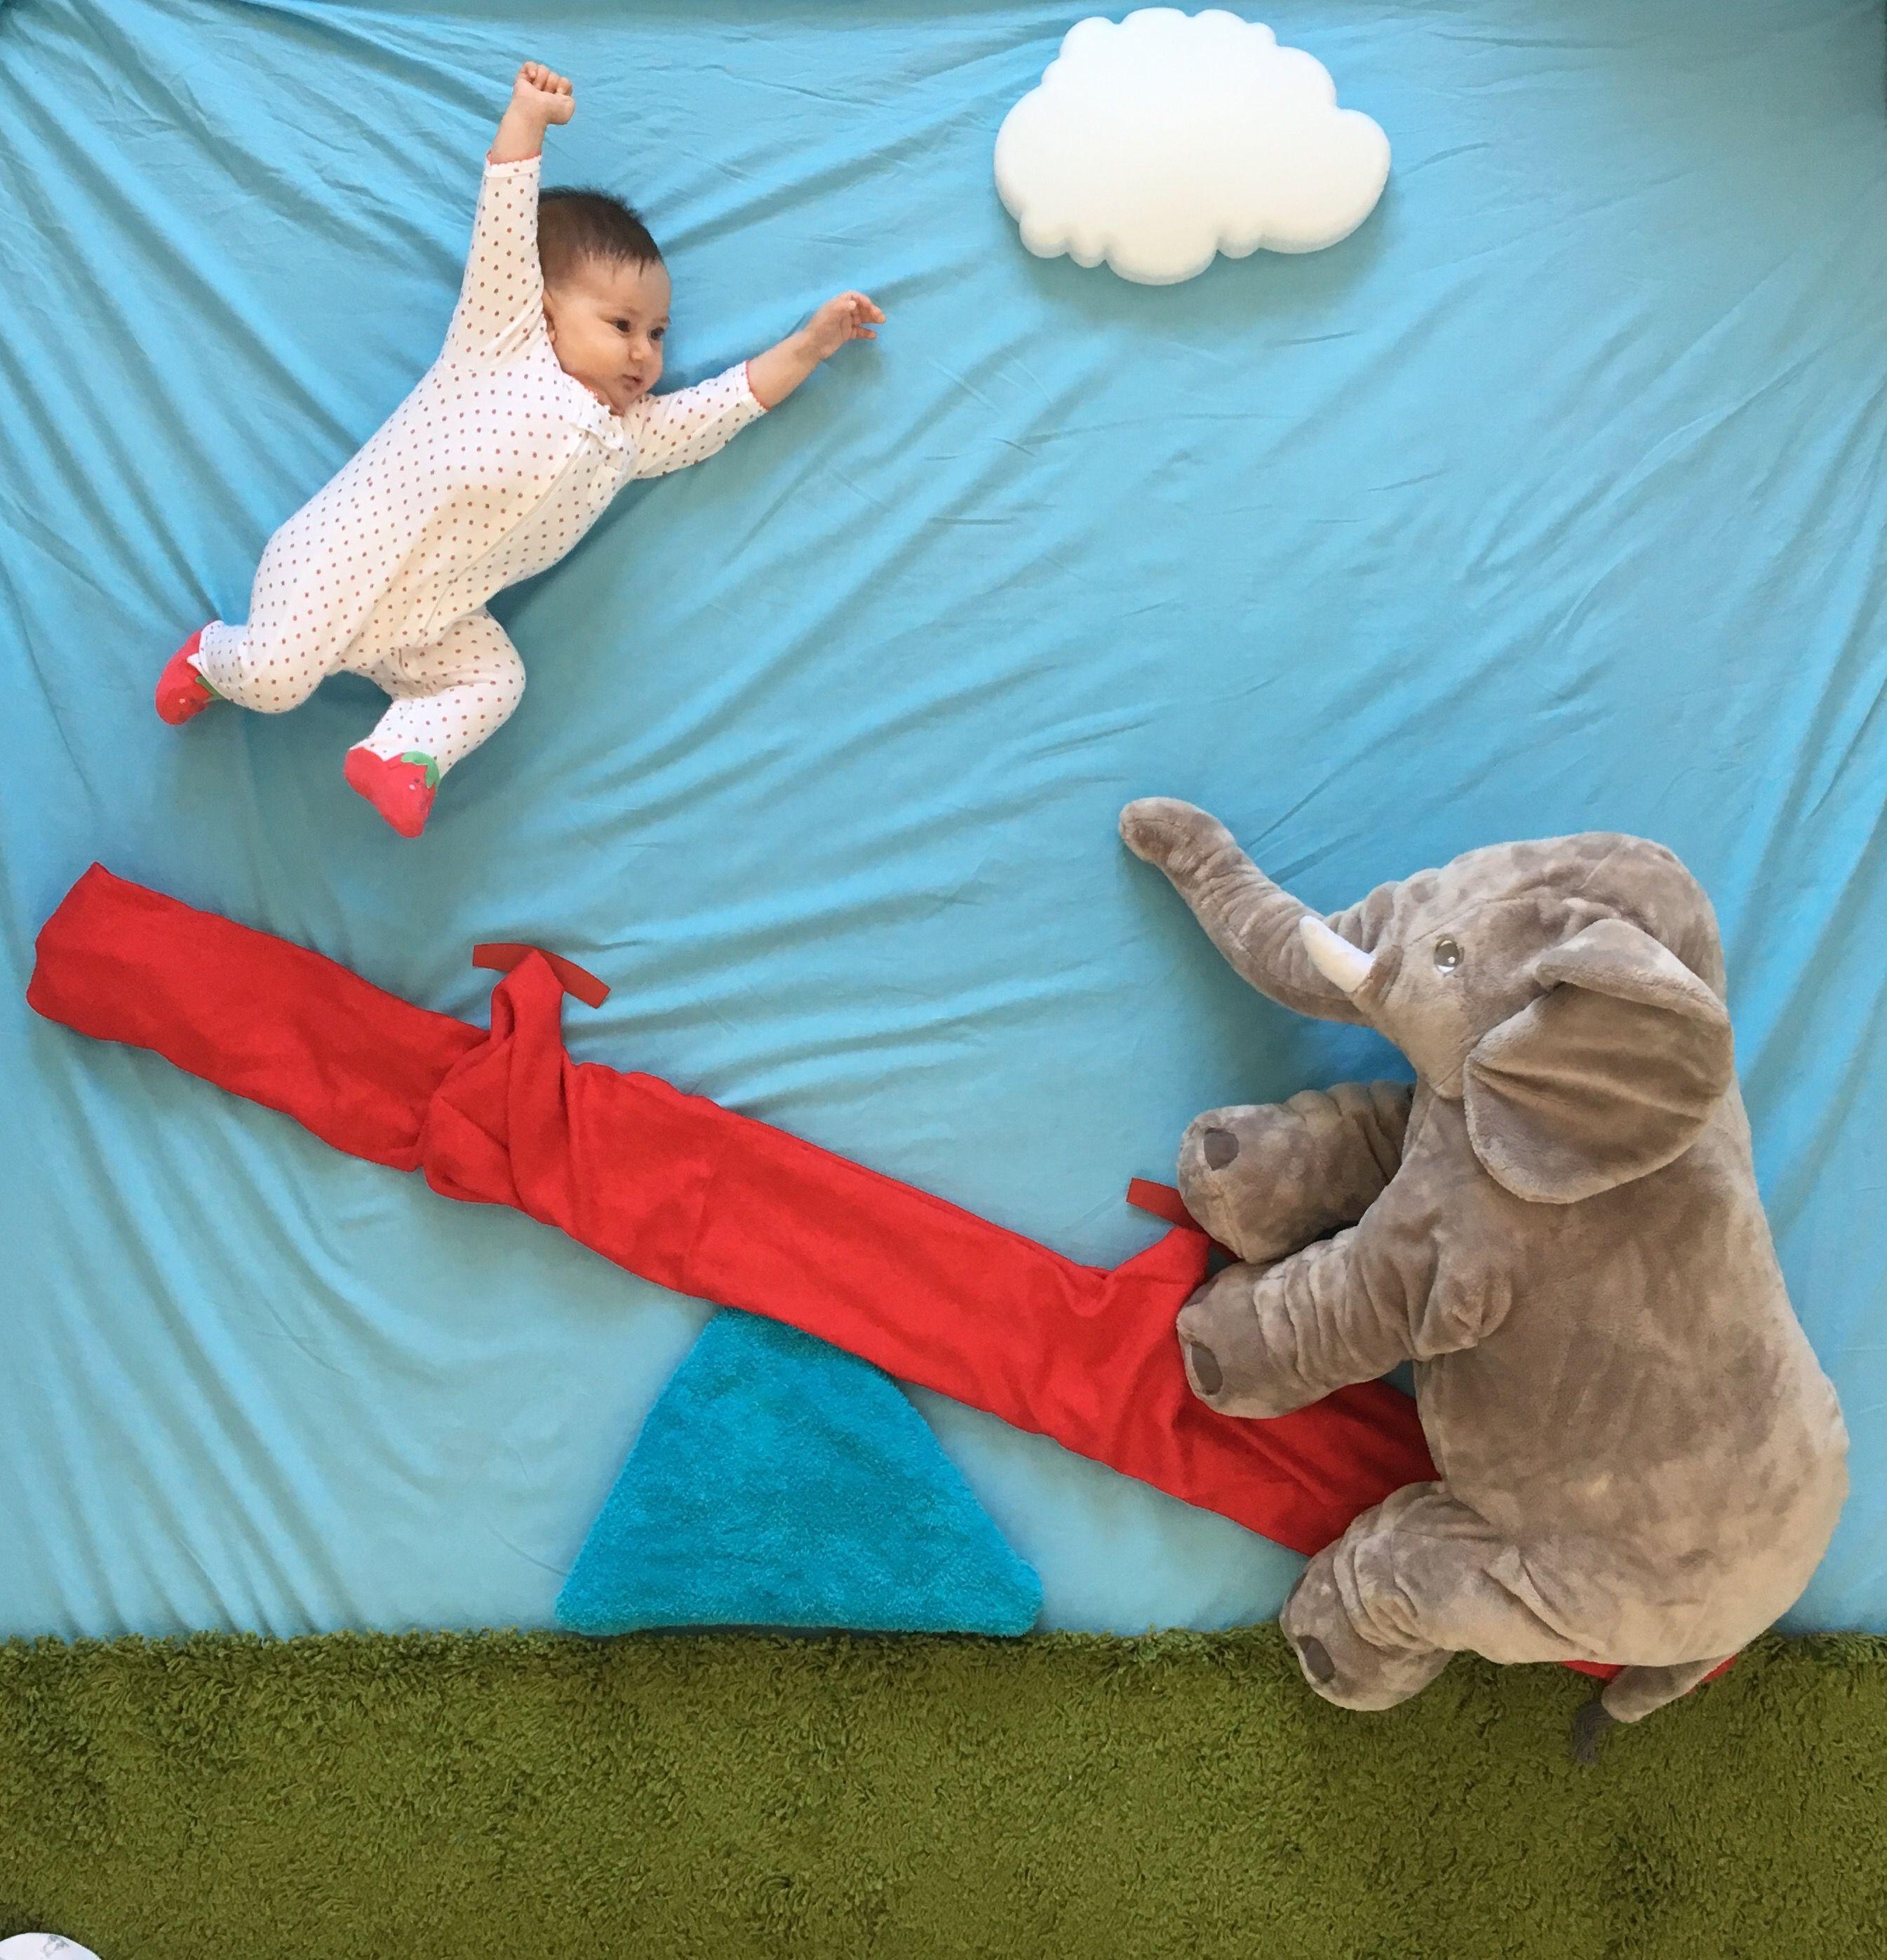 wippen mit elefant megas idee shooting zu hause baby pinterest. Black Bedroom Furniture Sets. Home Design Ideas